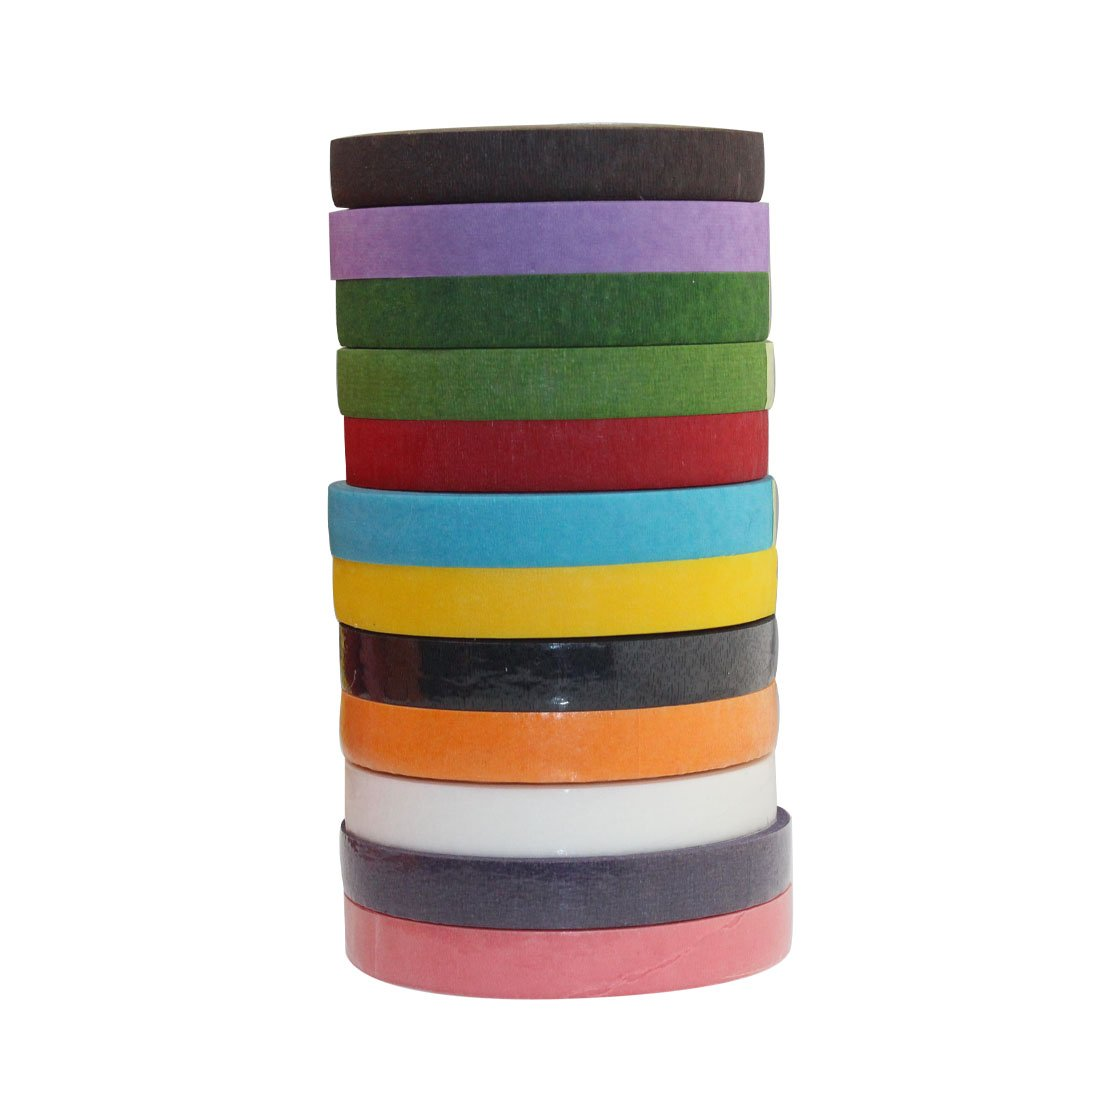 DECORA a Dozen 1/2-inch by 30 Yard Color Floral Tape for Bouquet Stem Wrap Floral Arranging Craft Projects Corsages, Wedding Bouquet